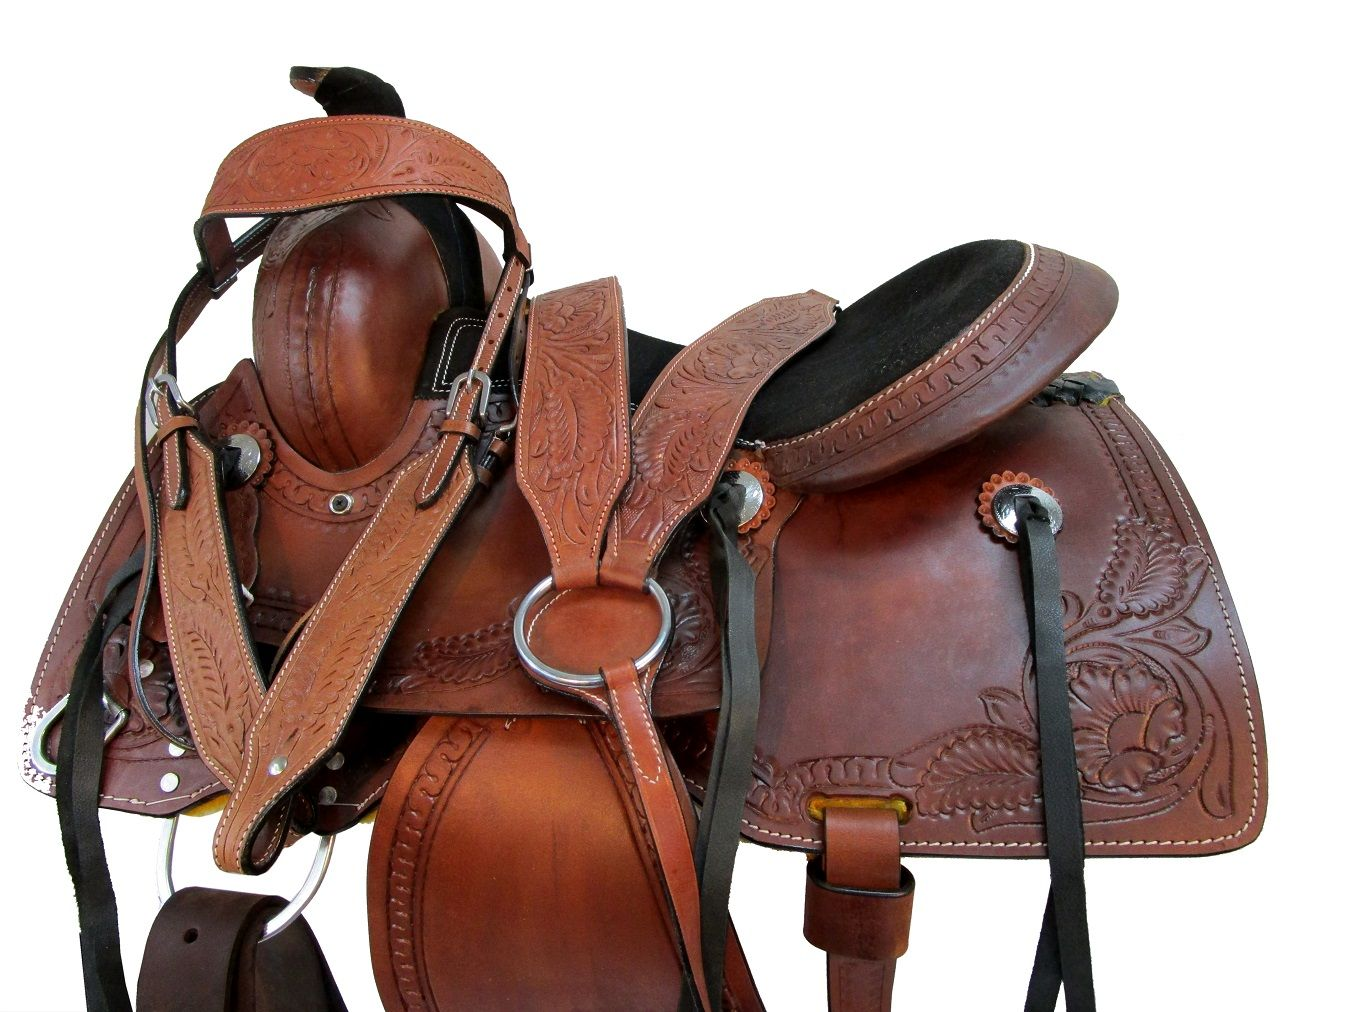 Arabian Horse Western Saddle 15 16 17 Pleasure Trail Snake Border Tooled Leather Ebay